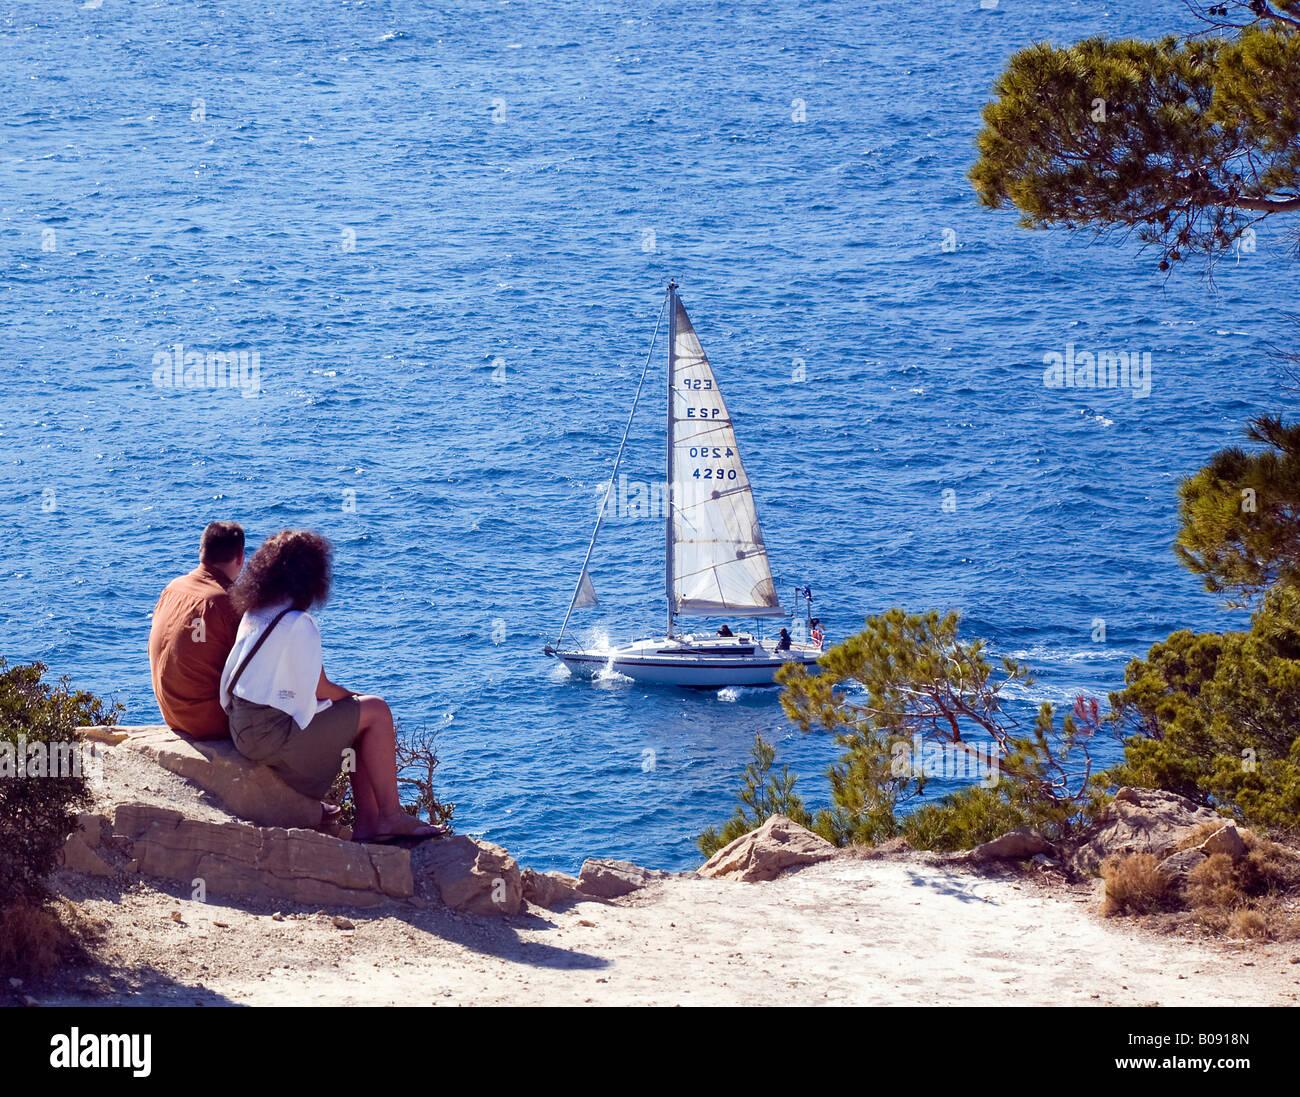 Couple sitting on the edge of a steep coast watching a sailboat near Sant Elm, Majorca, Balearic Islands, Spain Stock Photo